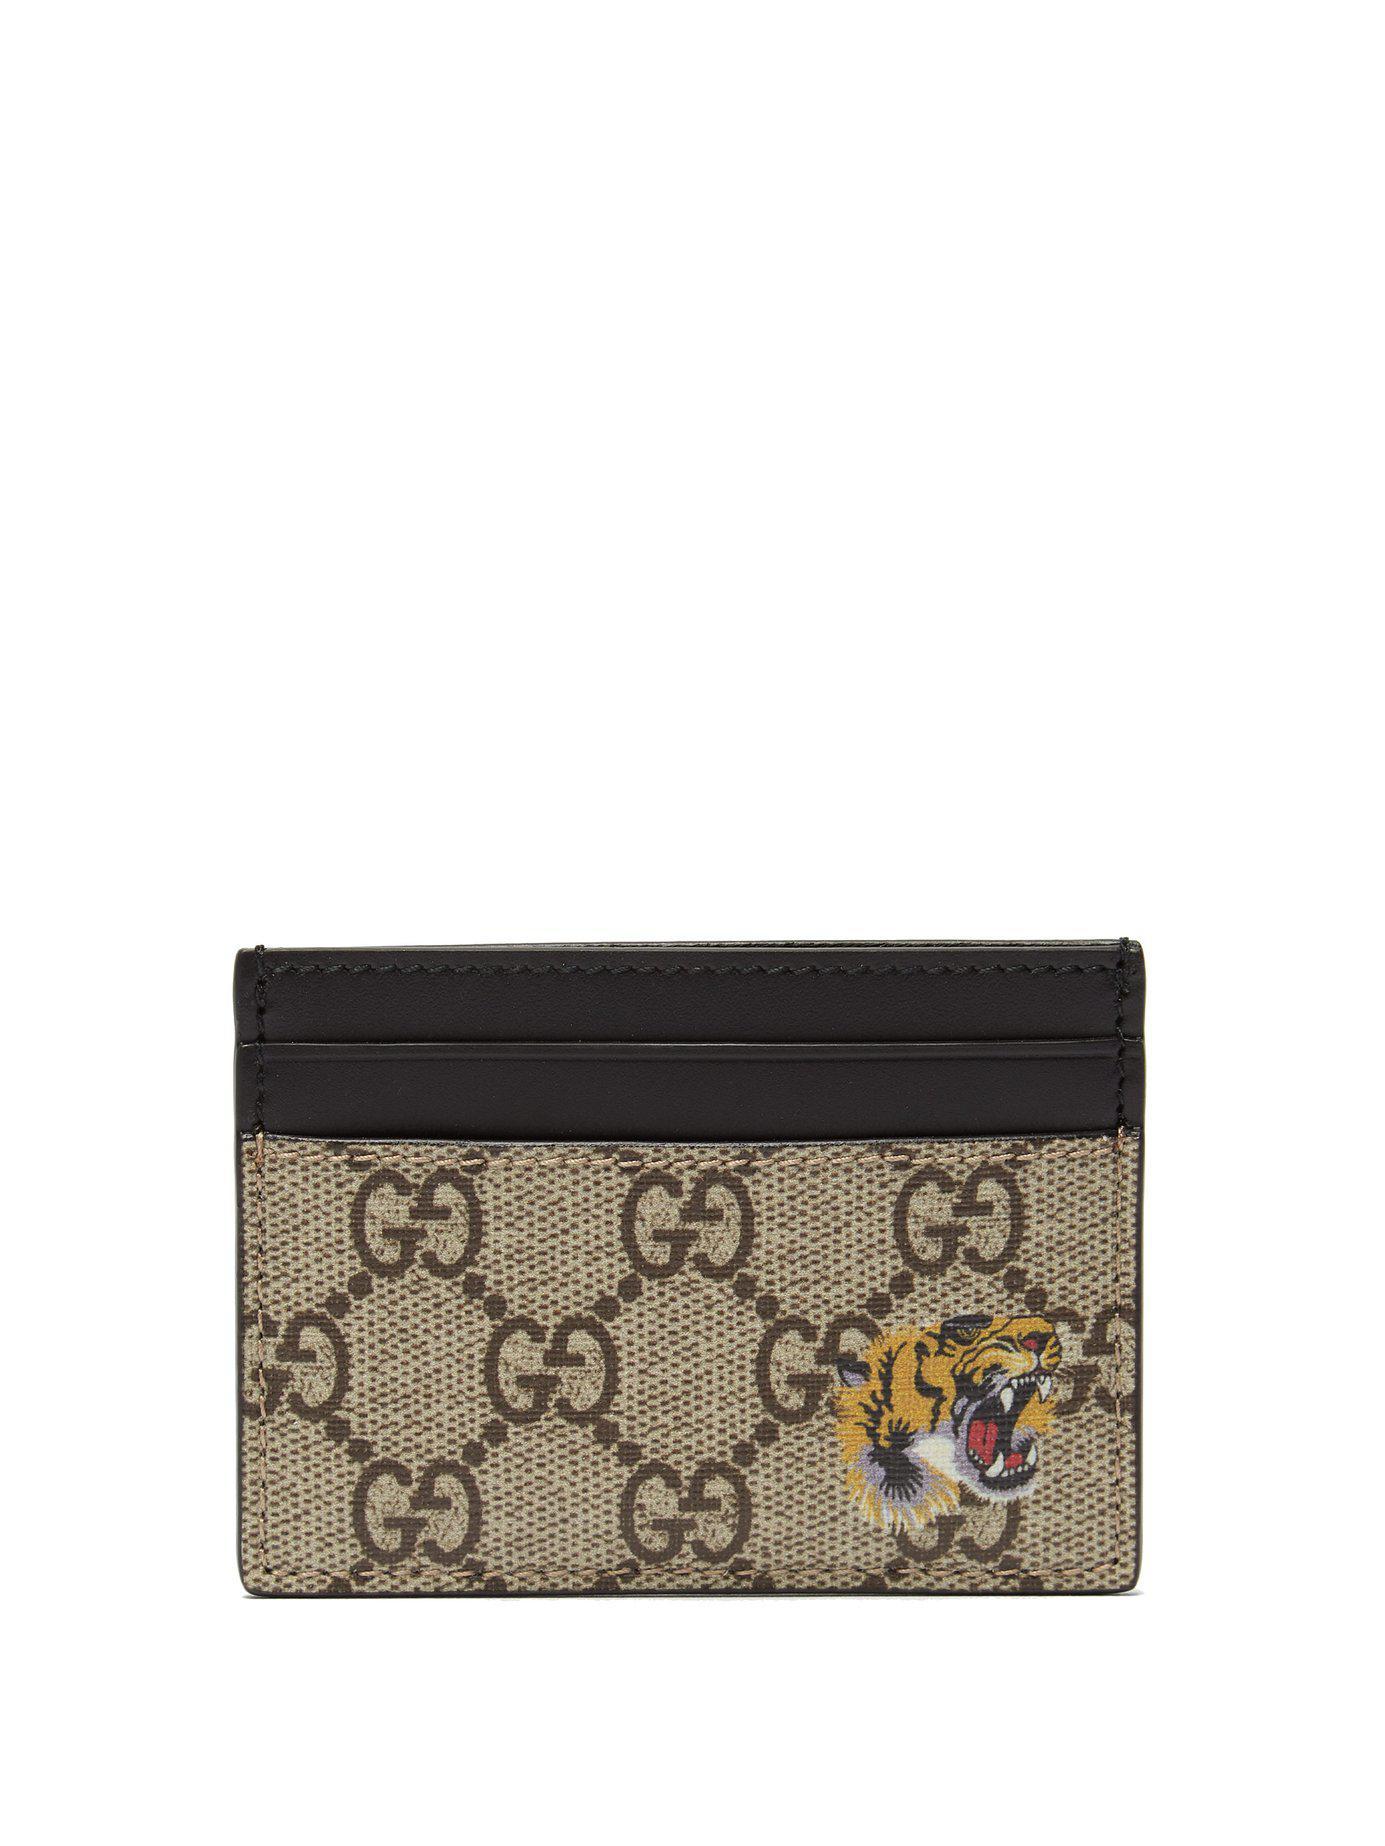 e903b64392a9 Gucci Gg Supreme Tiger Print Canvas Cardholder in Brown for Men - Lyst